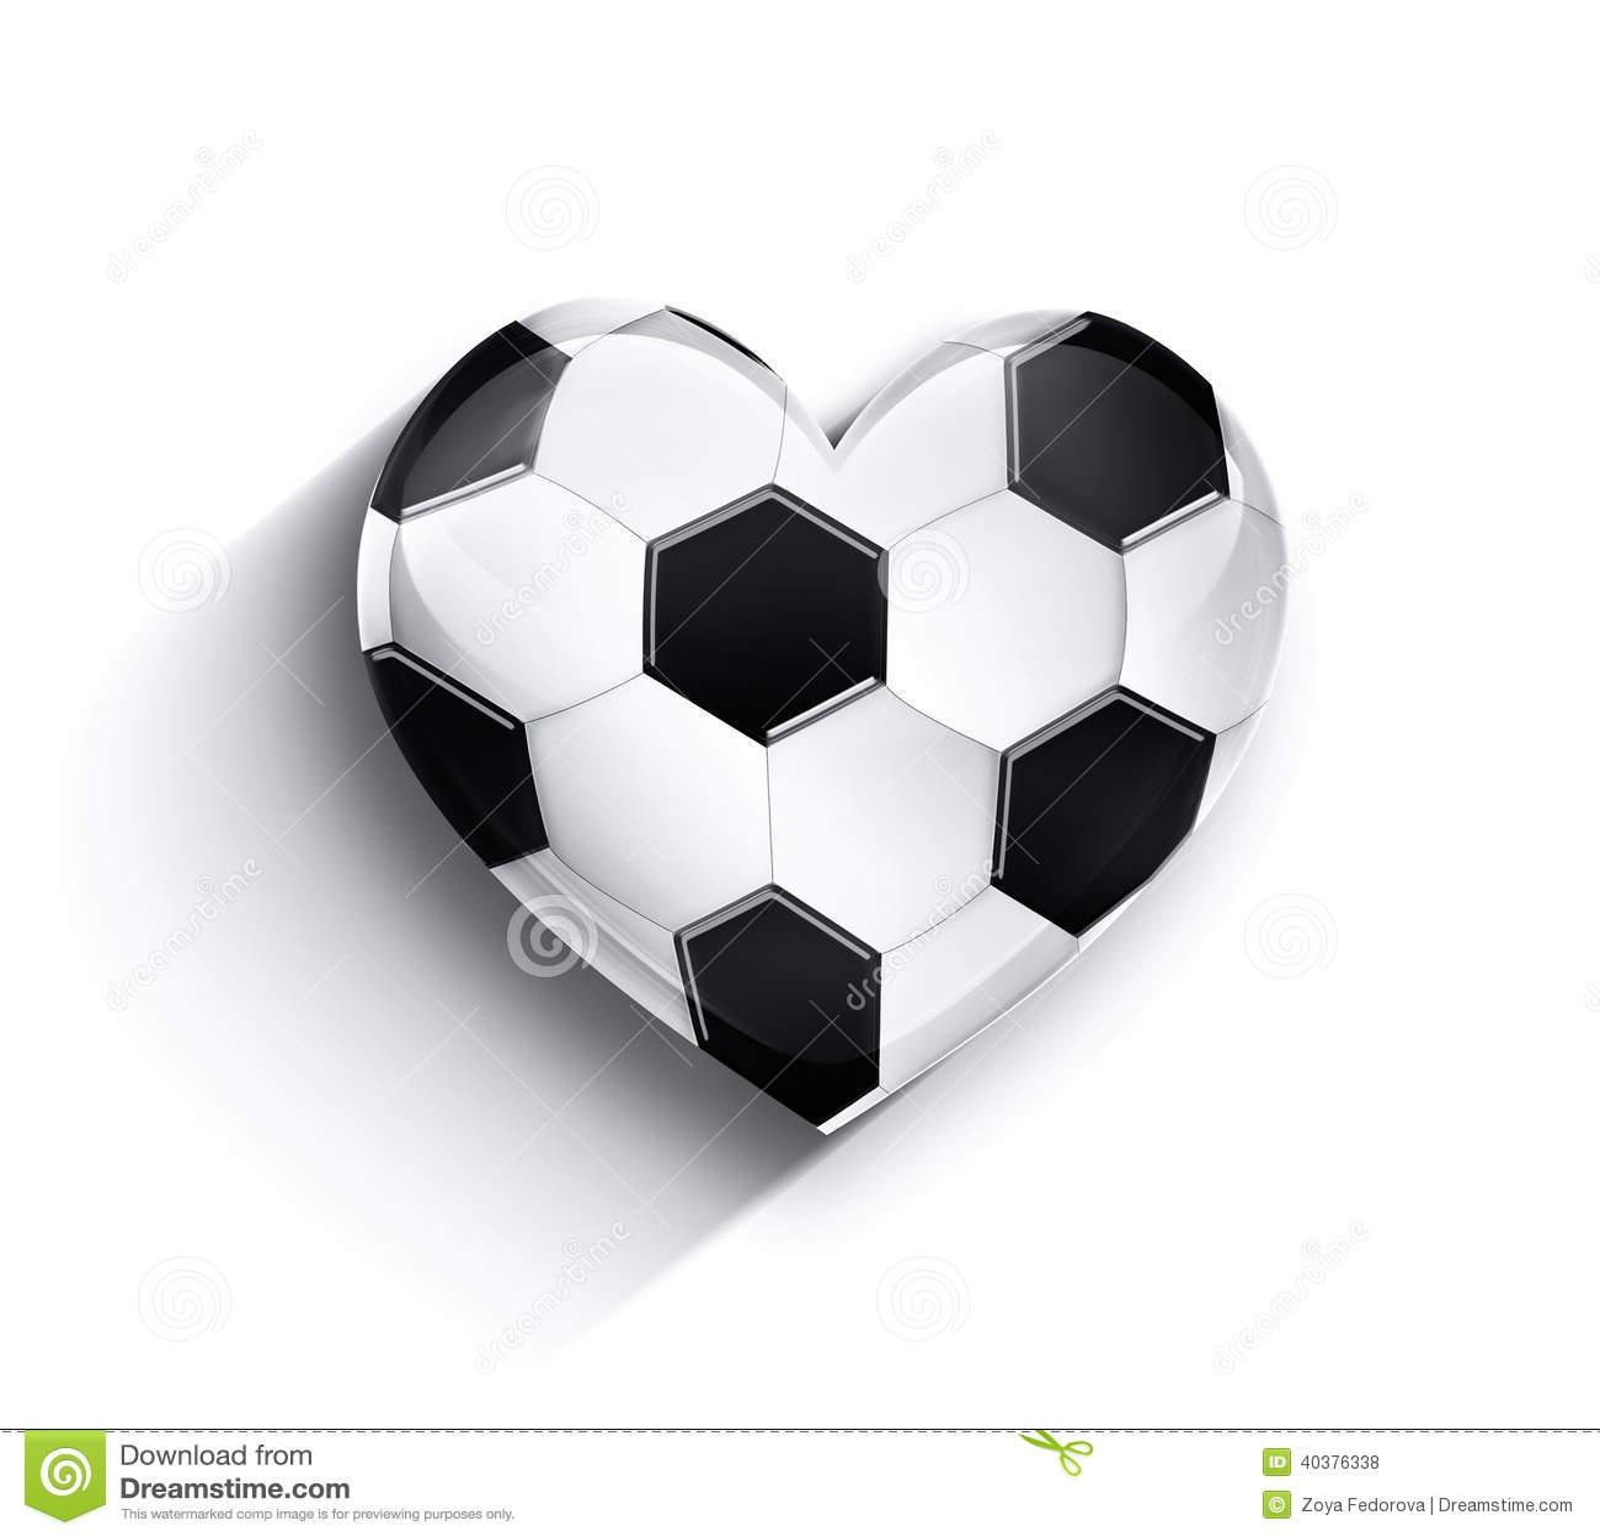 Heart of football stock illustration illustration of image 40376338 heart of football image love buycottarizona